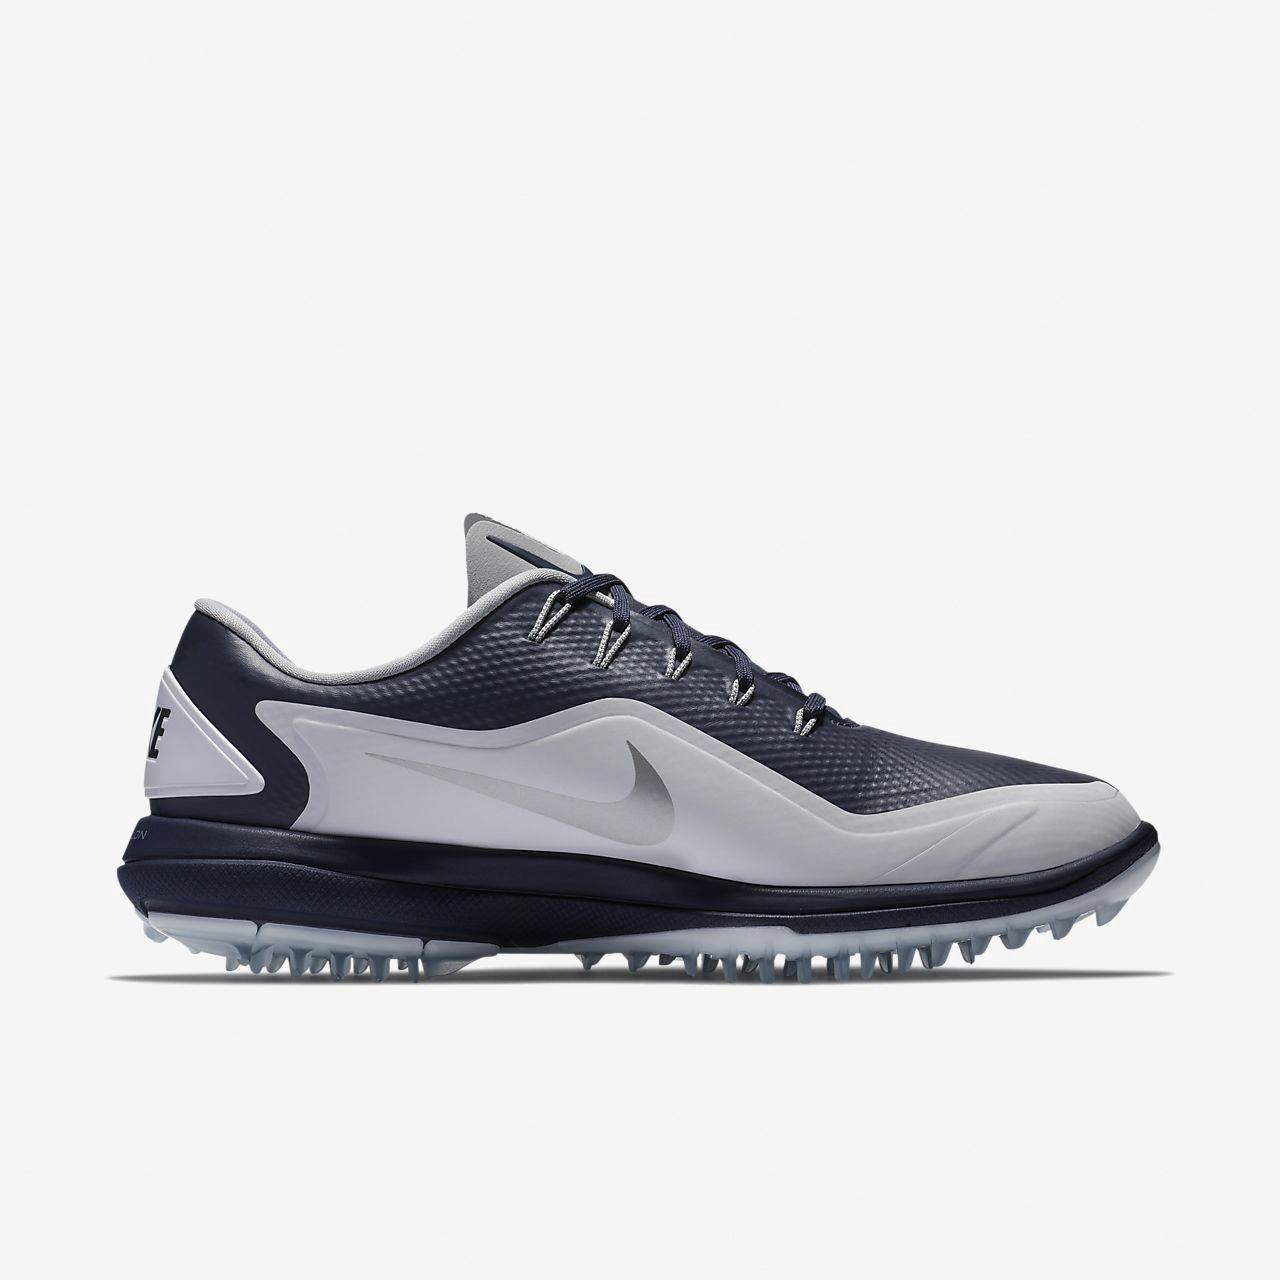 "35a4e1356a99f1 Nike Lunar Control Vapor 2 Men s Golf Shoe - 10.5 Silver  ""mensgolftips"""